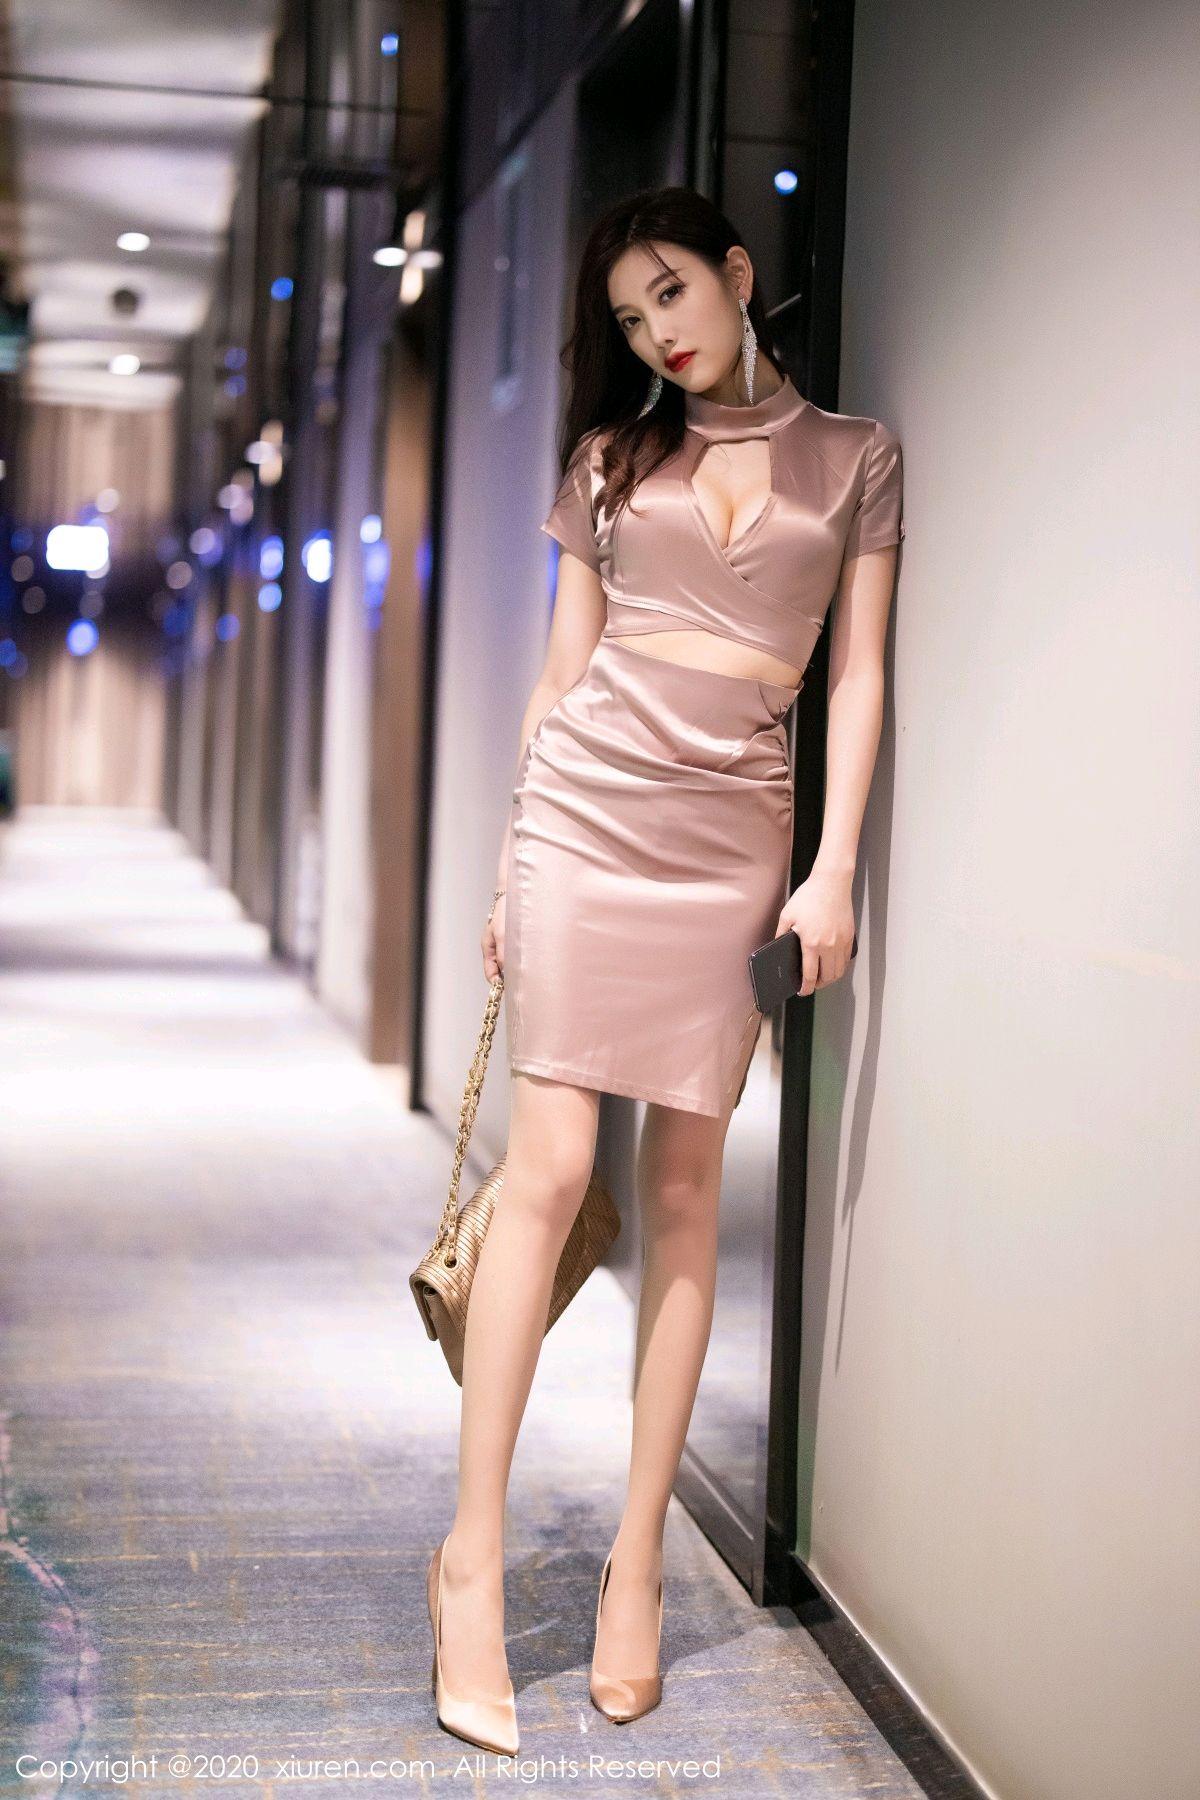 [XiuRen] Vol.2587 Yang Chen Chen 22P, Underwear, Xiuren, Yang Chen Chen